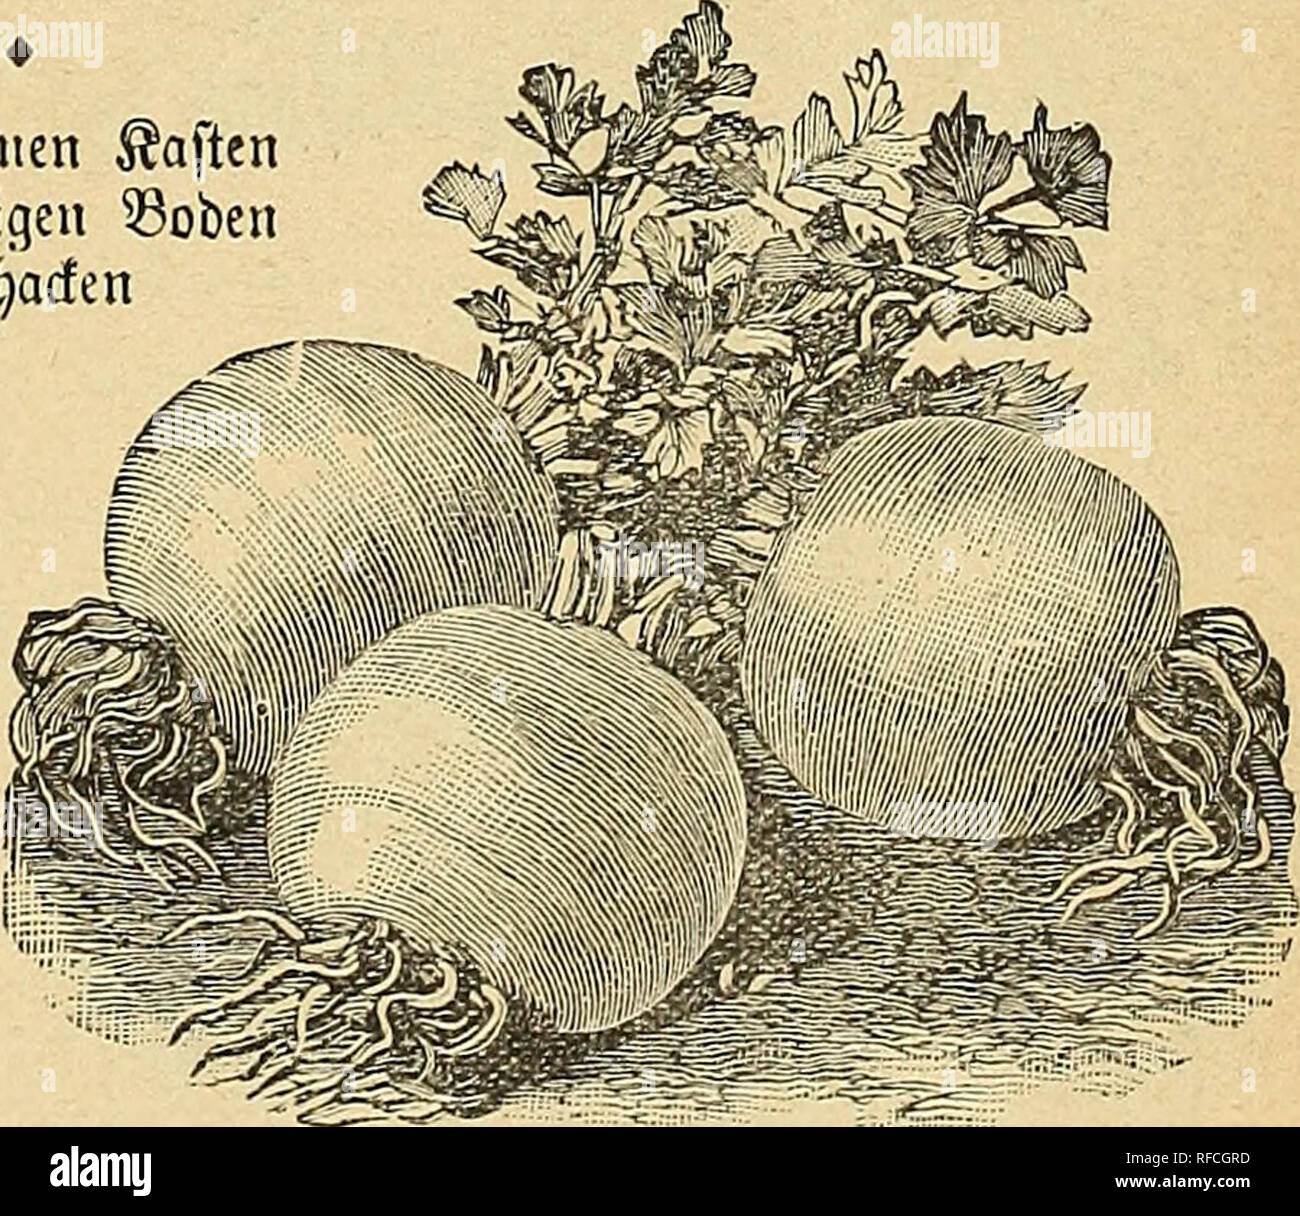 ". Seeds : 1898. Nursery stock Wisconsin Milwaukee Catalogs; Vegetables Seeds Catalogs; Flowers Seeds Catalogs. ""©olben @elf=53land)ing."" ©faUtfOfO'S %alb$WeVQ — (Sine berühmte ©orte bet ben Wlaxh-- gärtnern in ber Untgegenb Don SJcero ?)orf, ^3t)tIabe(pJ)ta unb SBafbington. ©ie befttst ade @igenfd)aften, metdje man Don peifefteut ©ederie Derlaugt: Seftigfett; tft niemals ijobl; SGBo^tgefctjmadf, einen eigenen nujjartigen; rofdjeS 5ß}acf)§tt)uro. Dbroobt eine ^roergart, liefert fic [chicere 33üfd;e. ' $er Unge 15c ÜB Oft Ott fffttiXtU— fturje, treibe ©orte. Dfme $rage einer ber beften. üße - Stock Image"